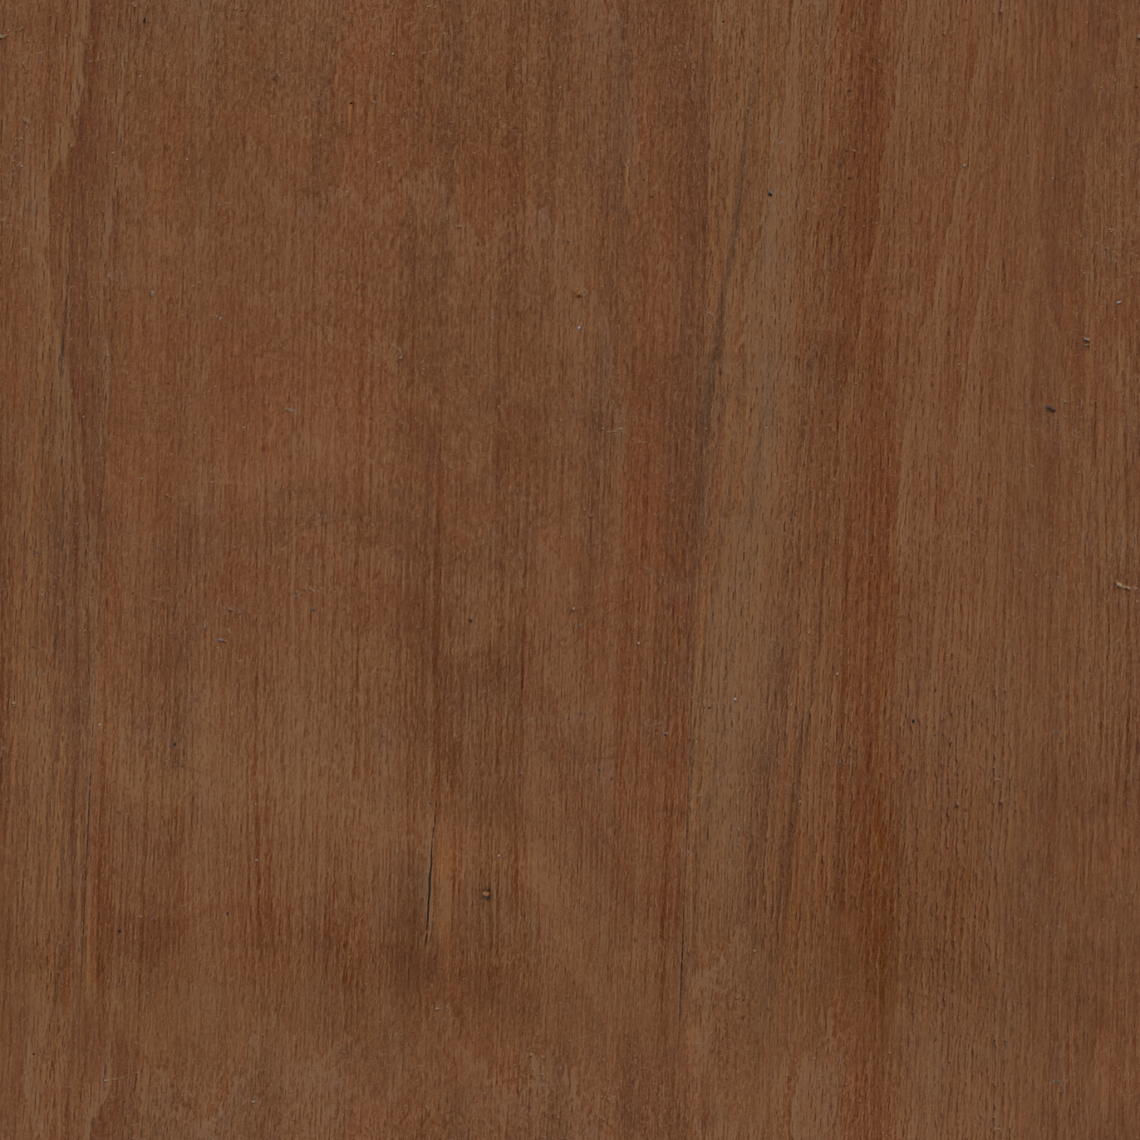 Wood-Plain-03-Albedo